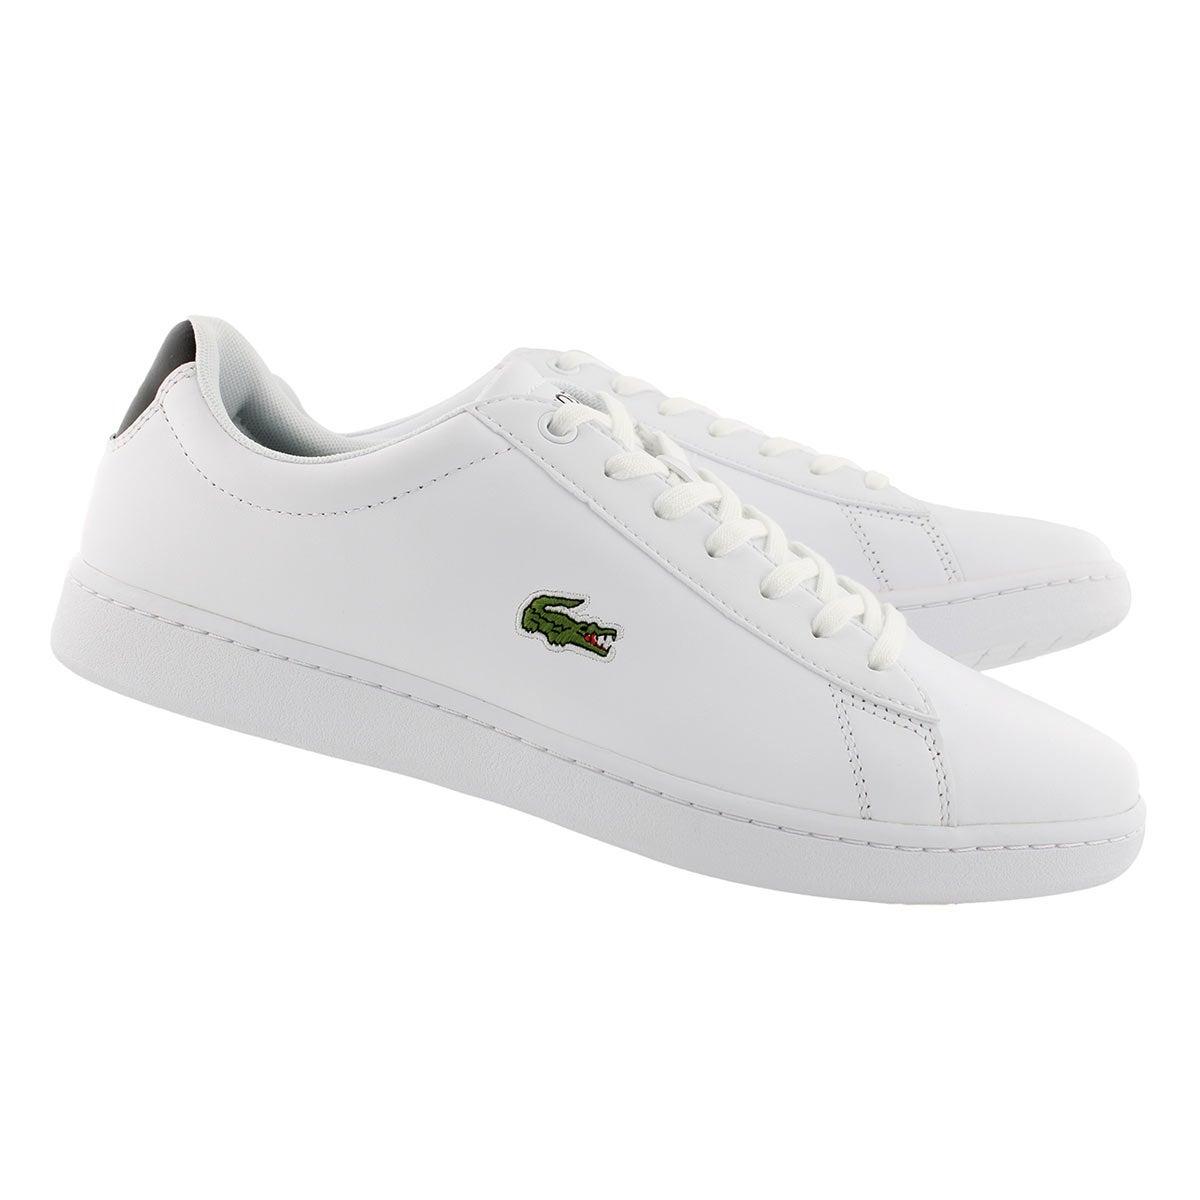 Mns Hydez 318 1 P wht/blk sneaker